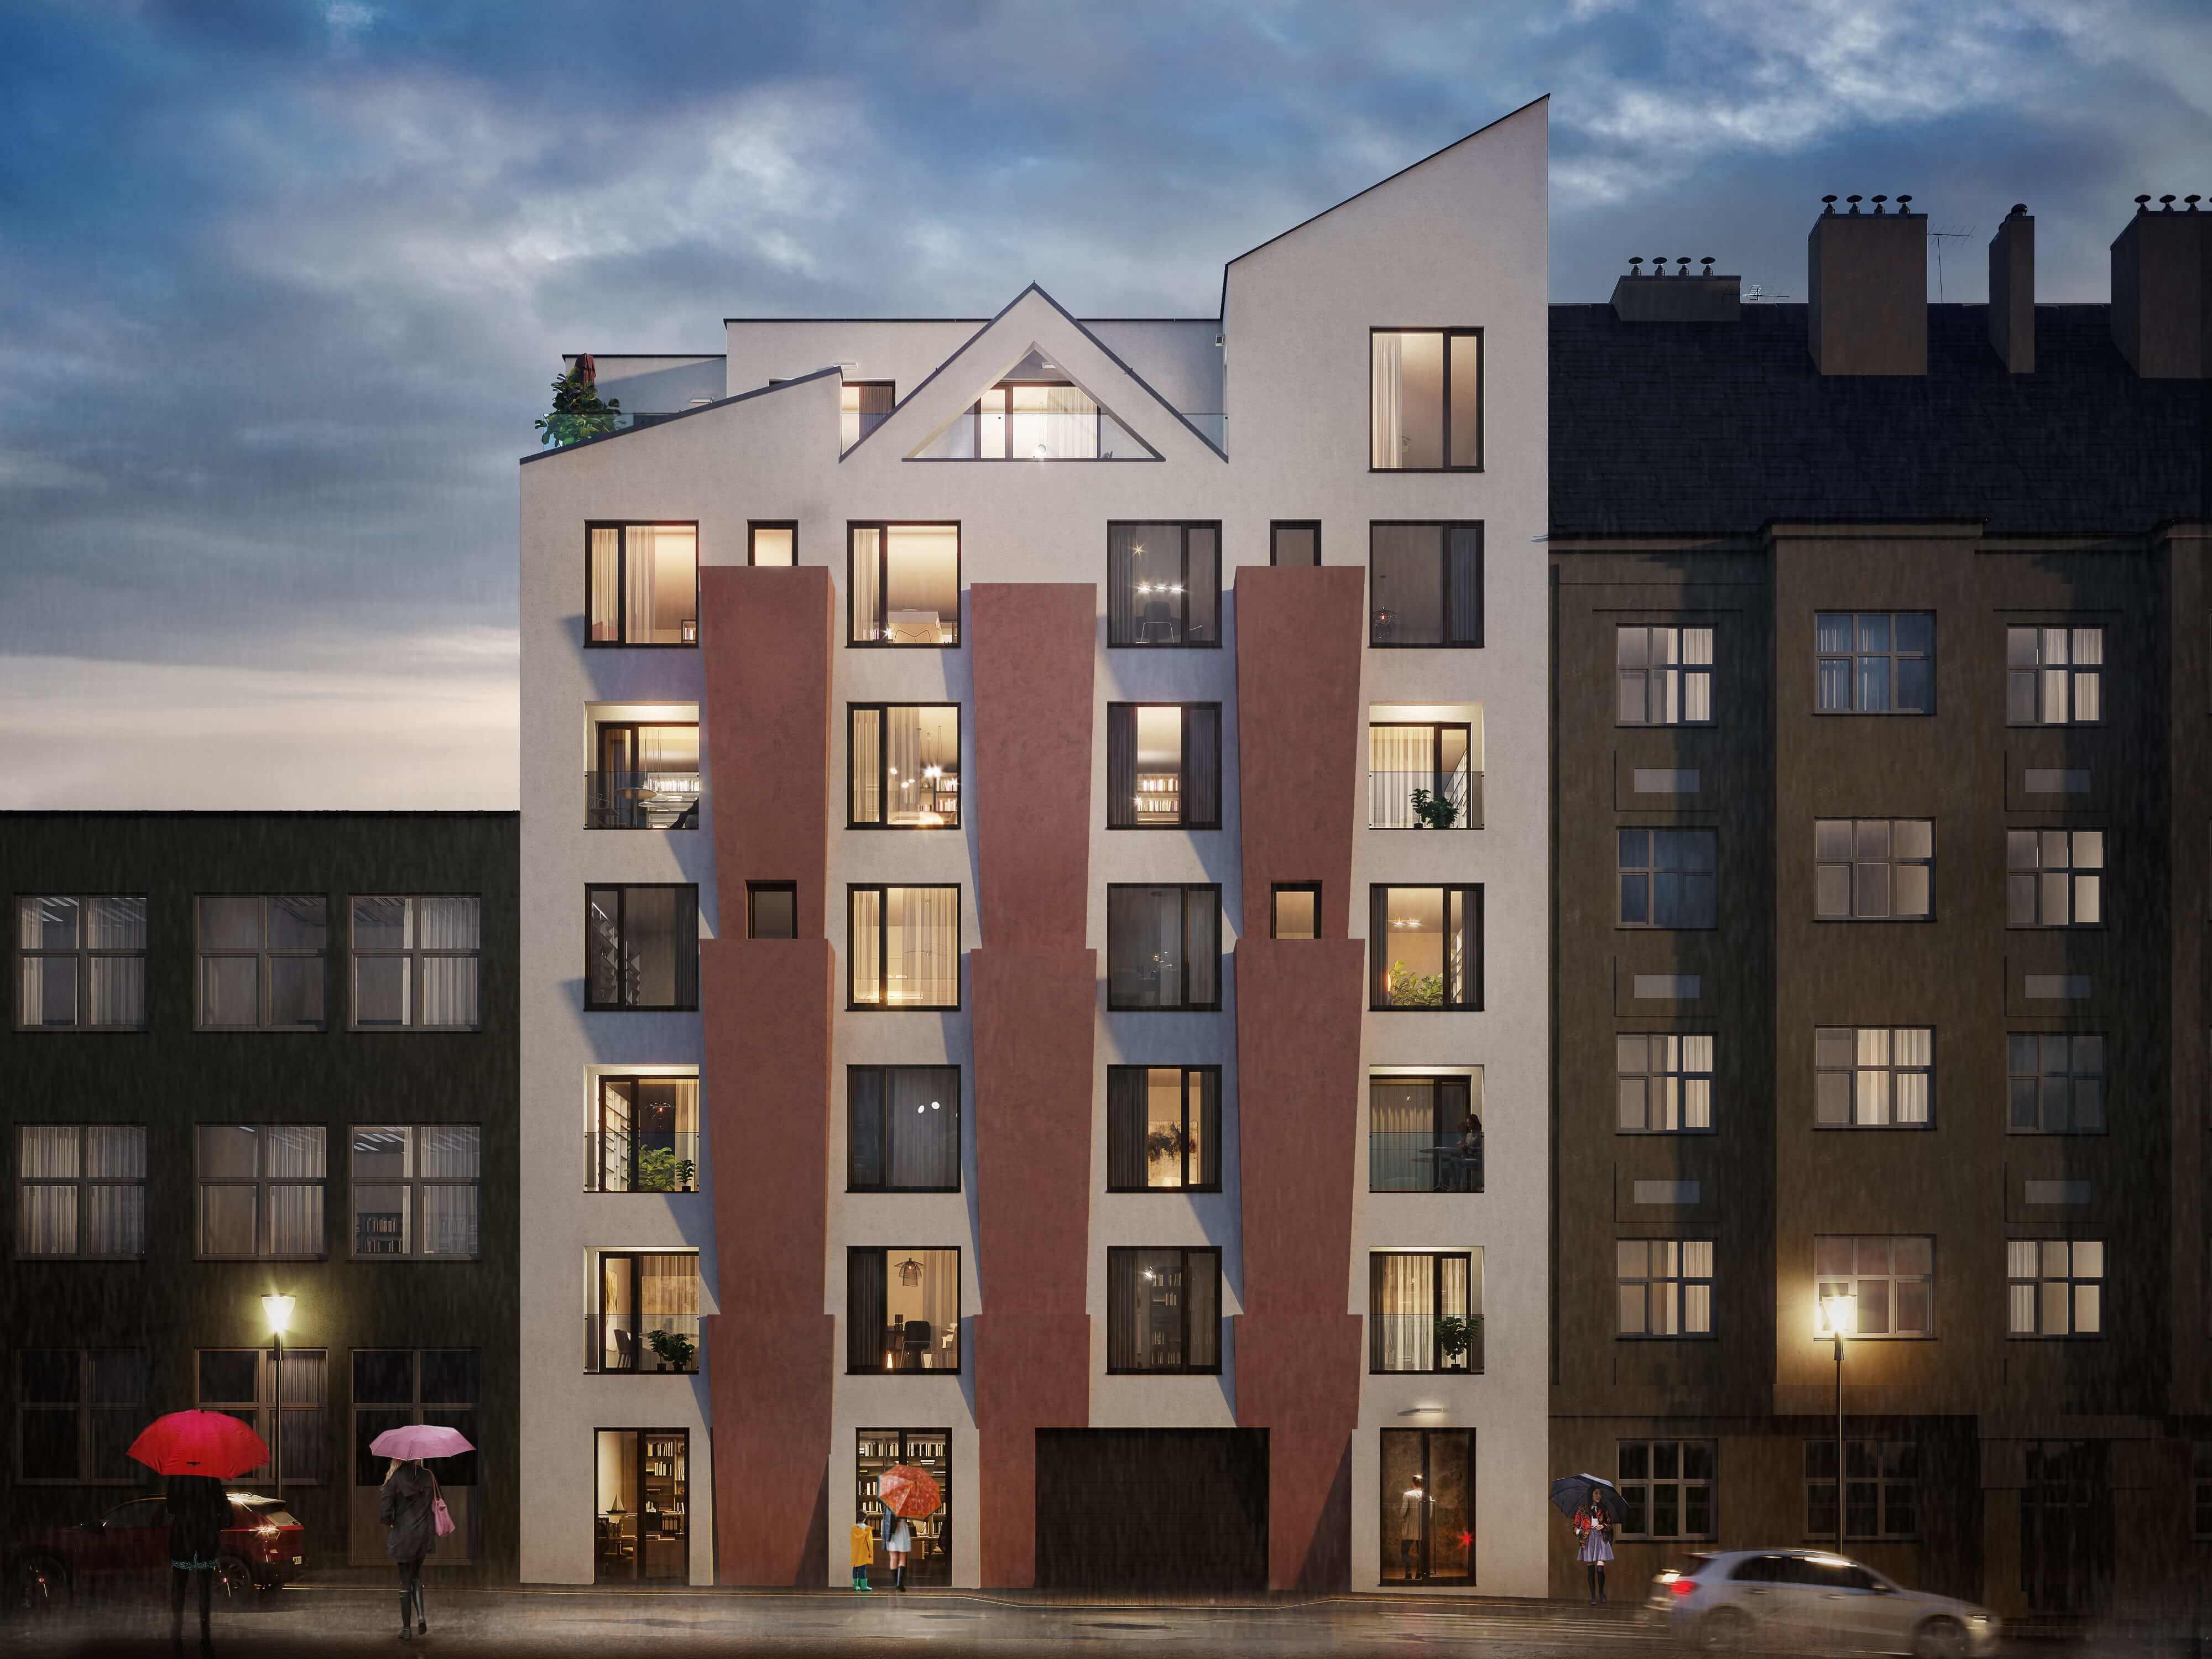 apartment for sale prague 9, new buildings prague, apartments for sale, prague, czech republic